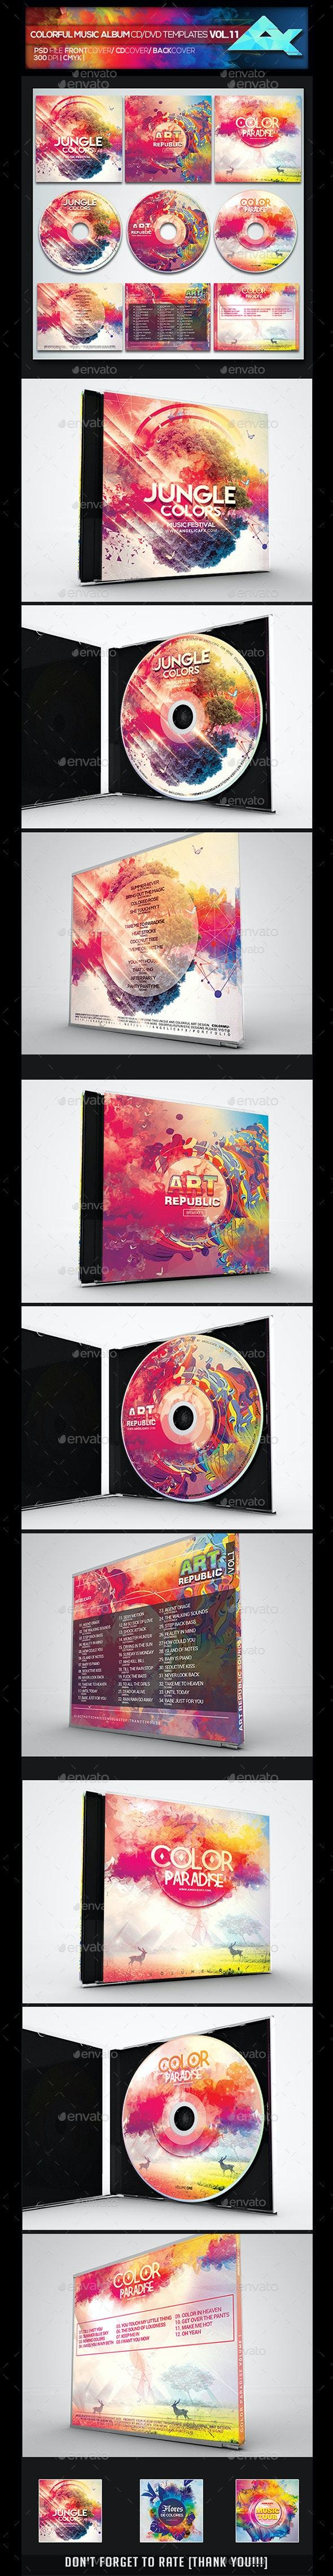 Colorful CD/DVD Album Covers Bundle Vol. 11 - CD & DVD Artwork Print Templates